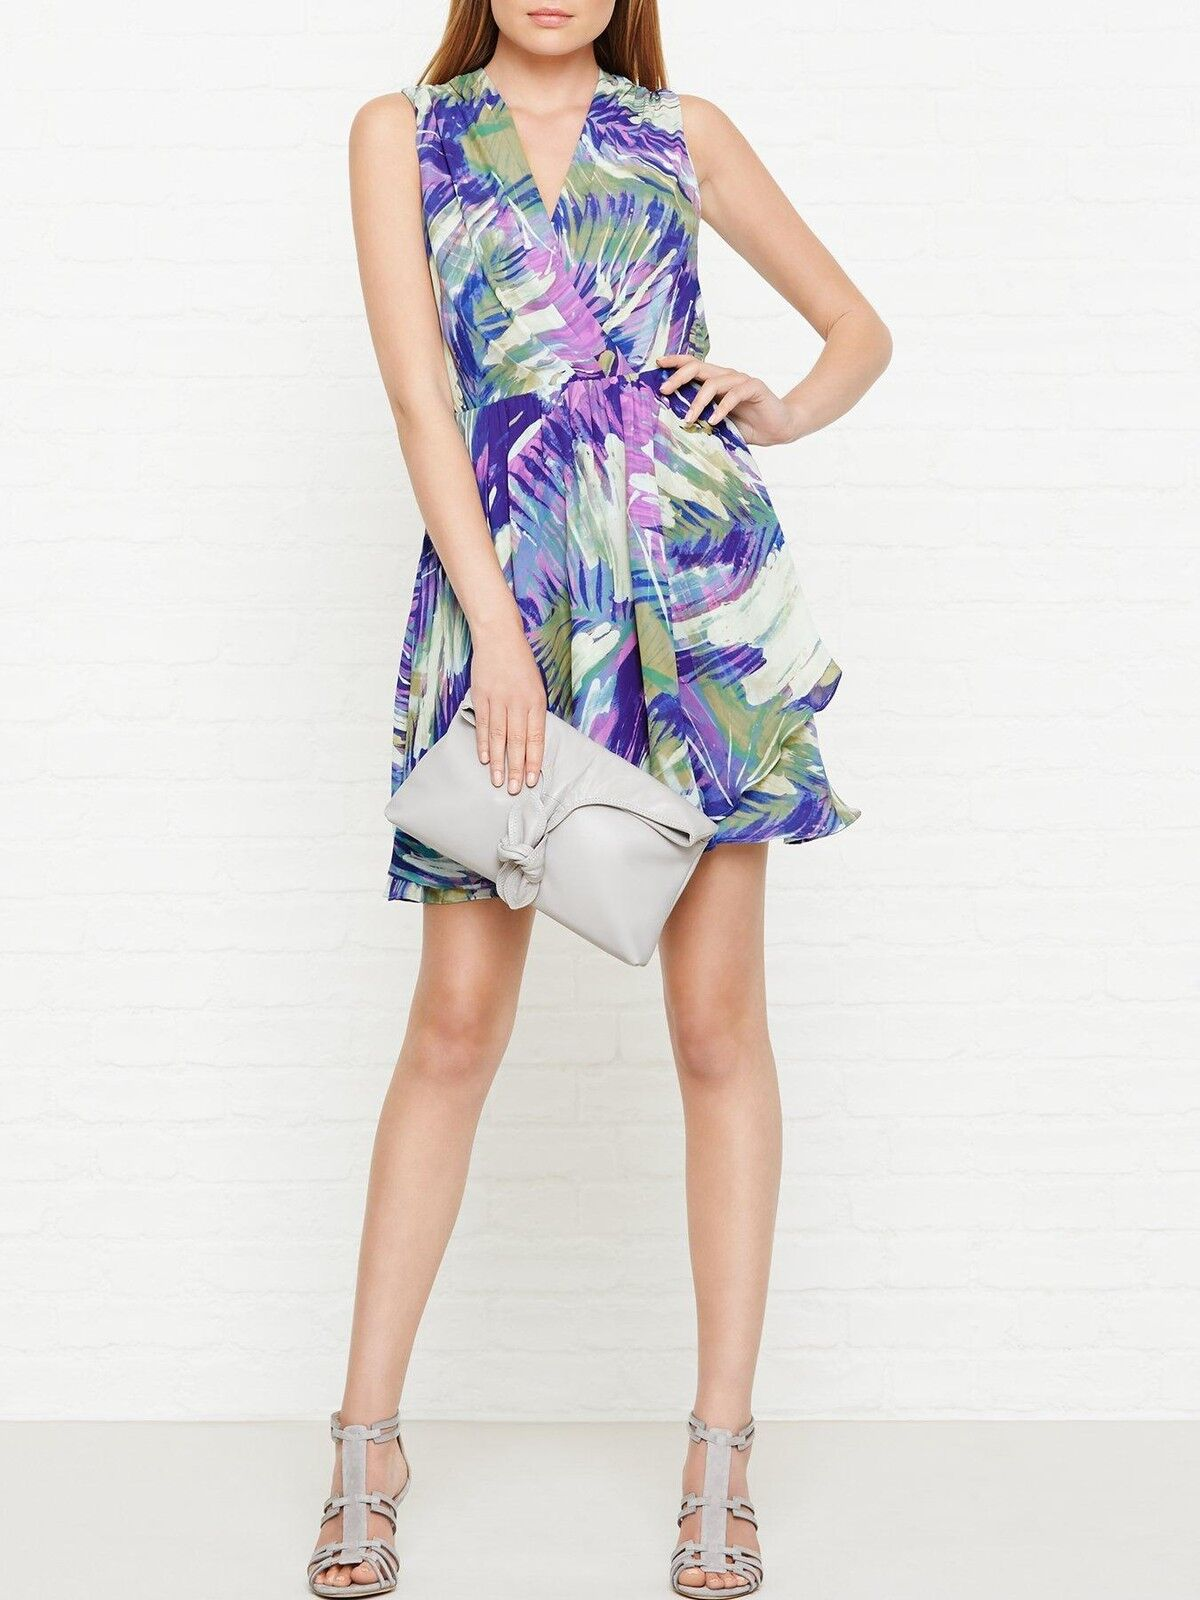 330 NWT Reiss Carmen Purple Draped Floral Palm Print Dress Size US 0  UK4